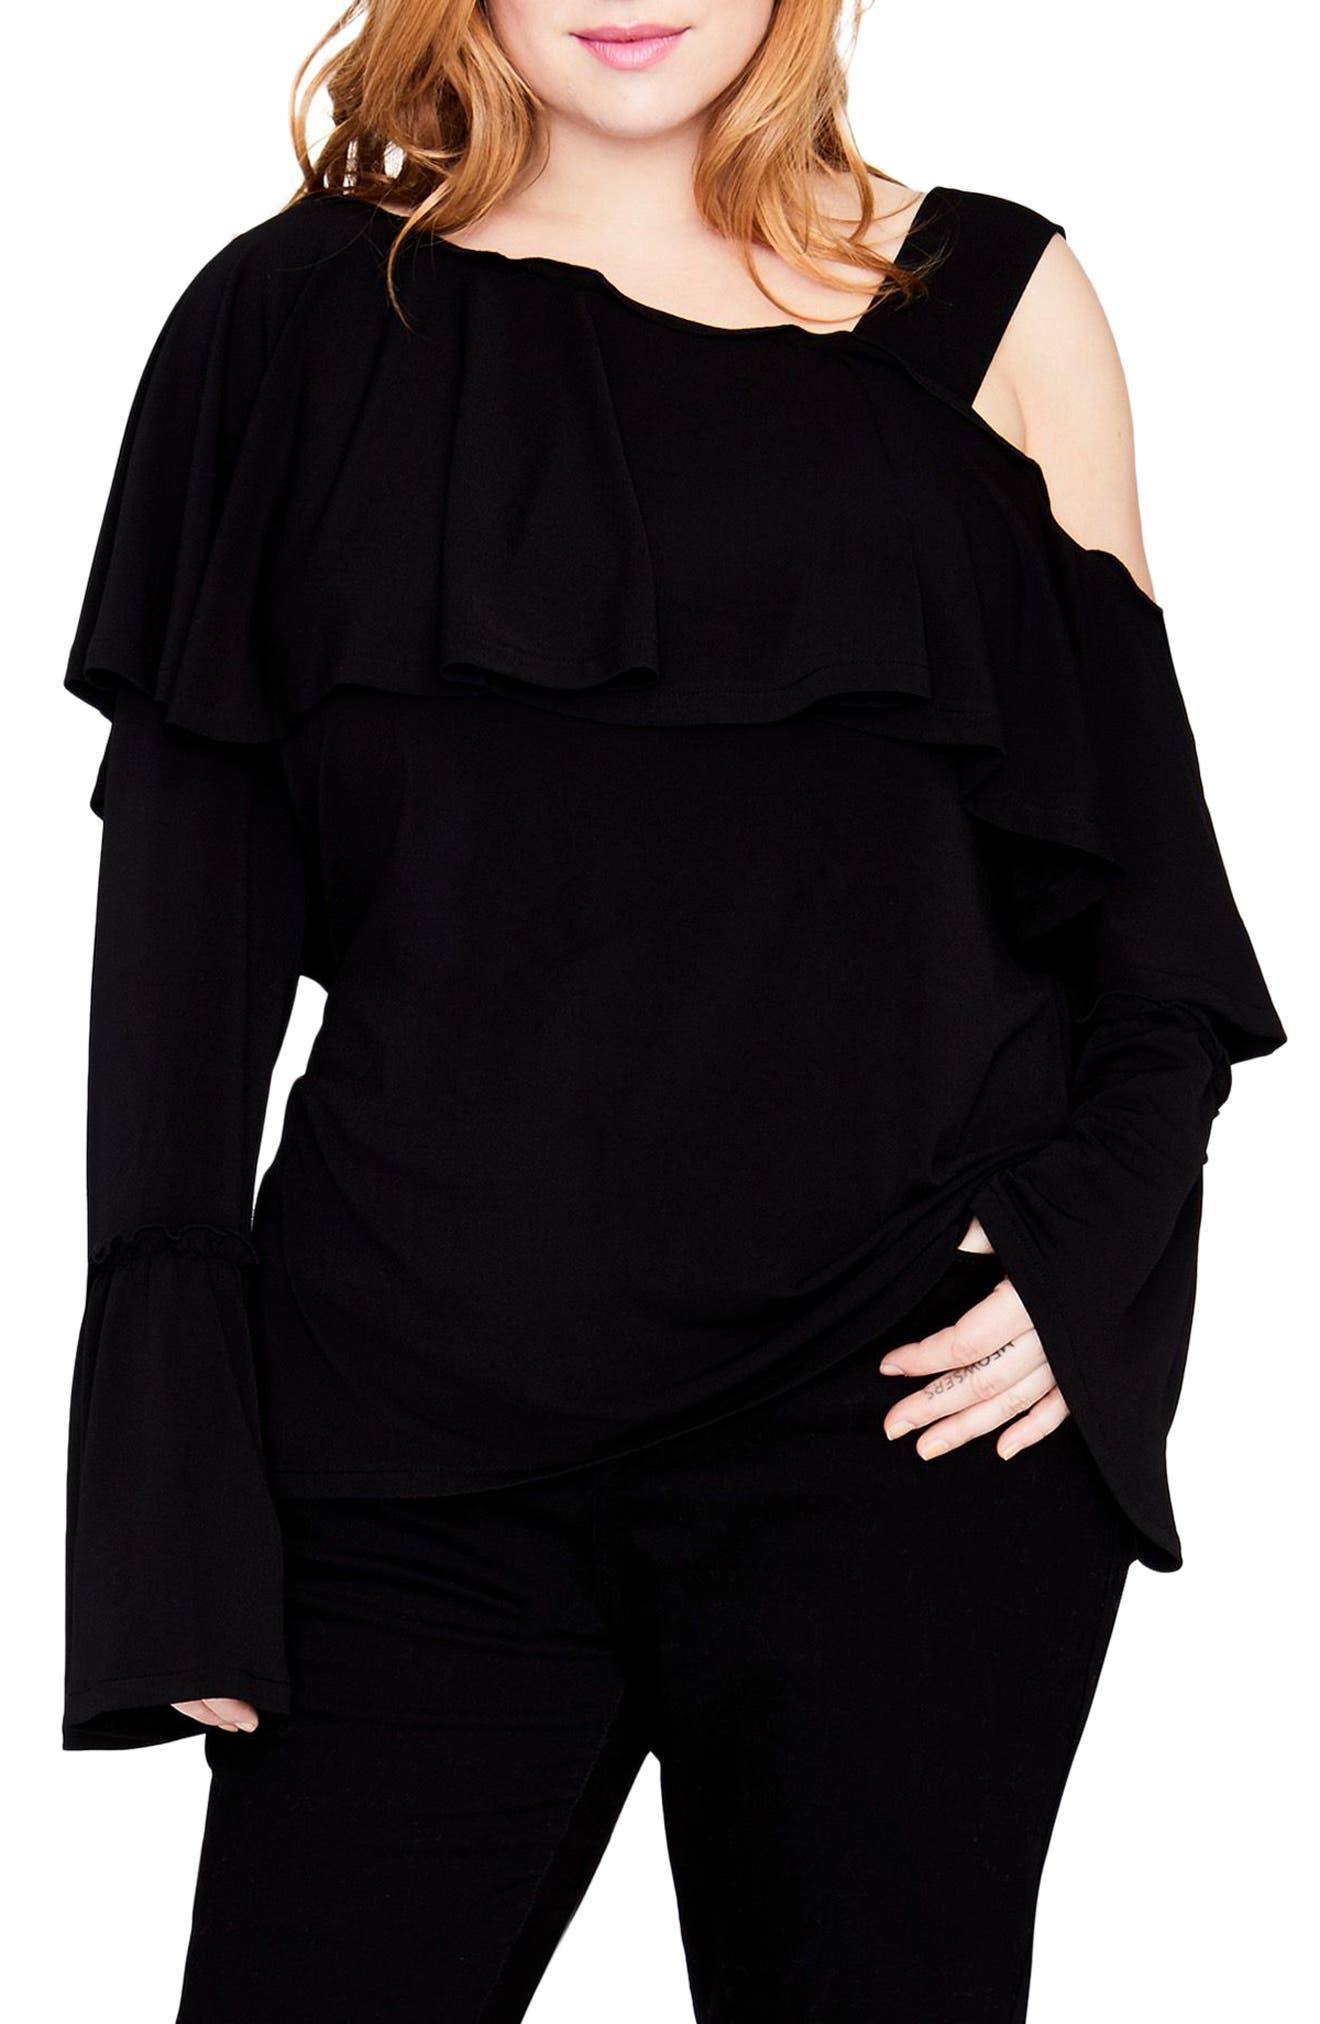 Alternate Image 1 Selected - RACHEL Rachel Roy Cold Shoulder Ruffle Top (Plus Size)